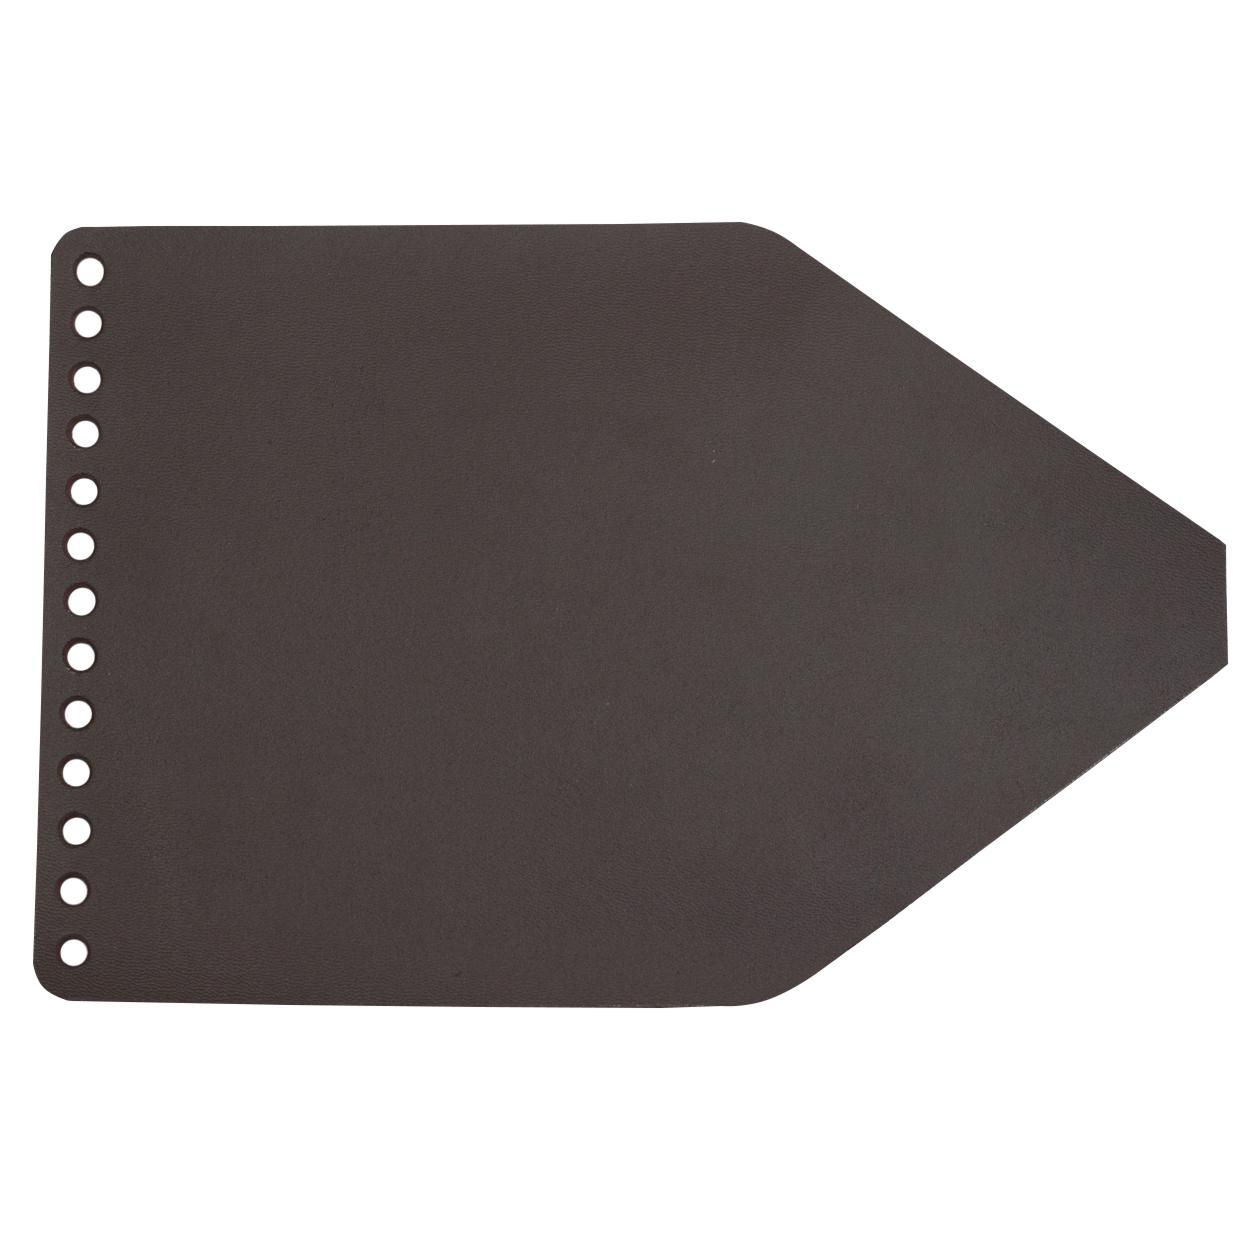 Кожаная фурнитура Клапан для рюкзачка кожаный темно-коричневый 2,5 мм IMG_9327.jpg